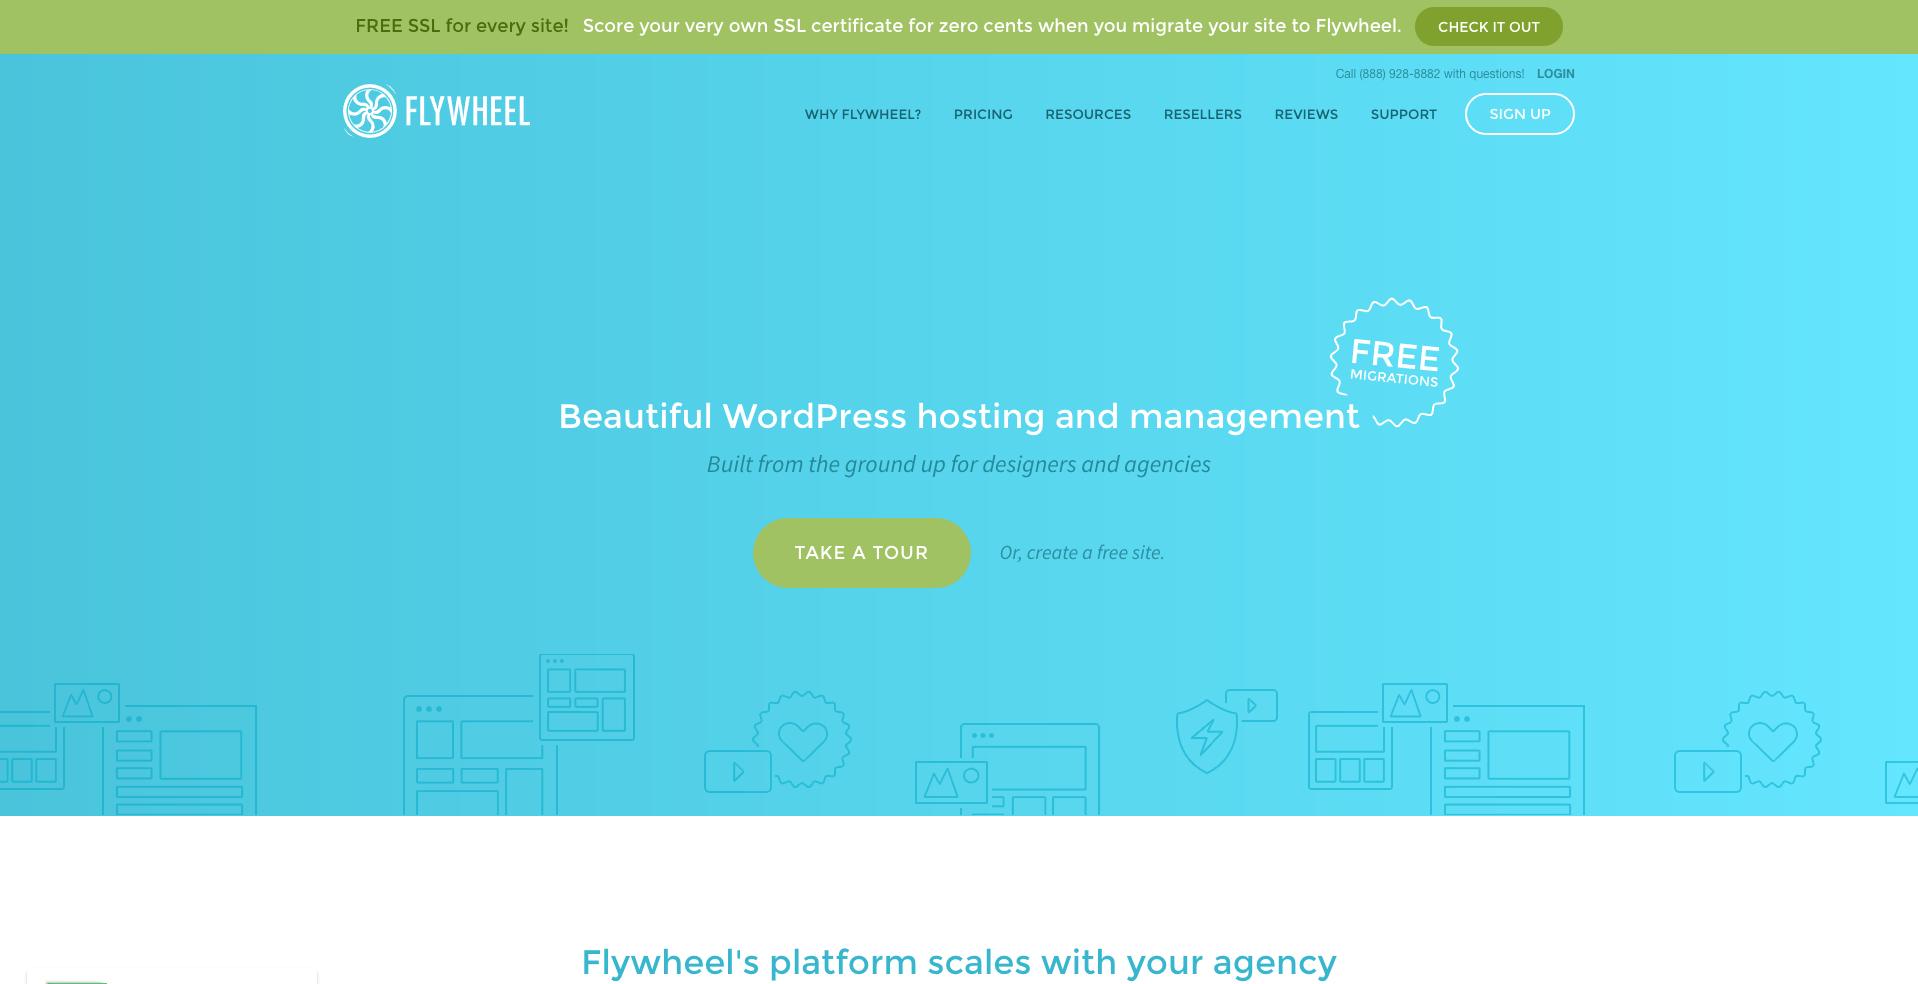 flywheel-managed-wordpress-hosting